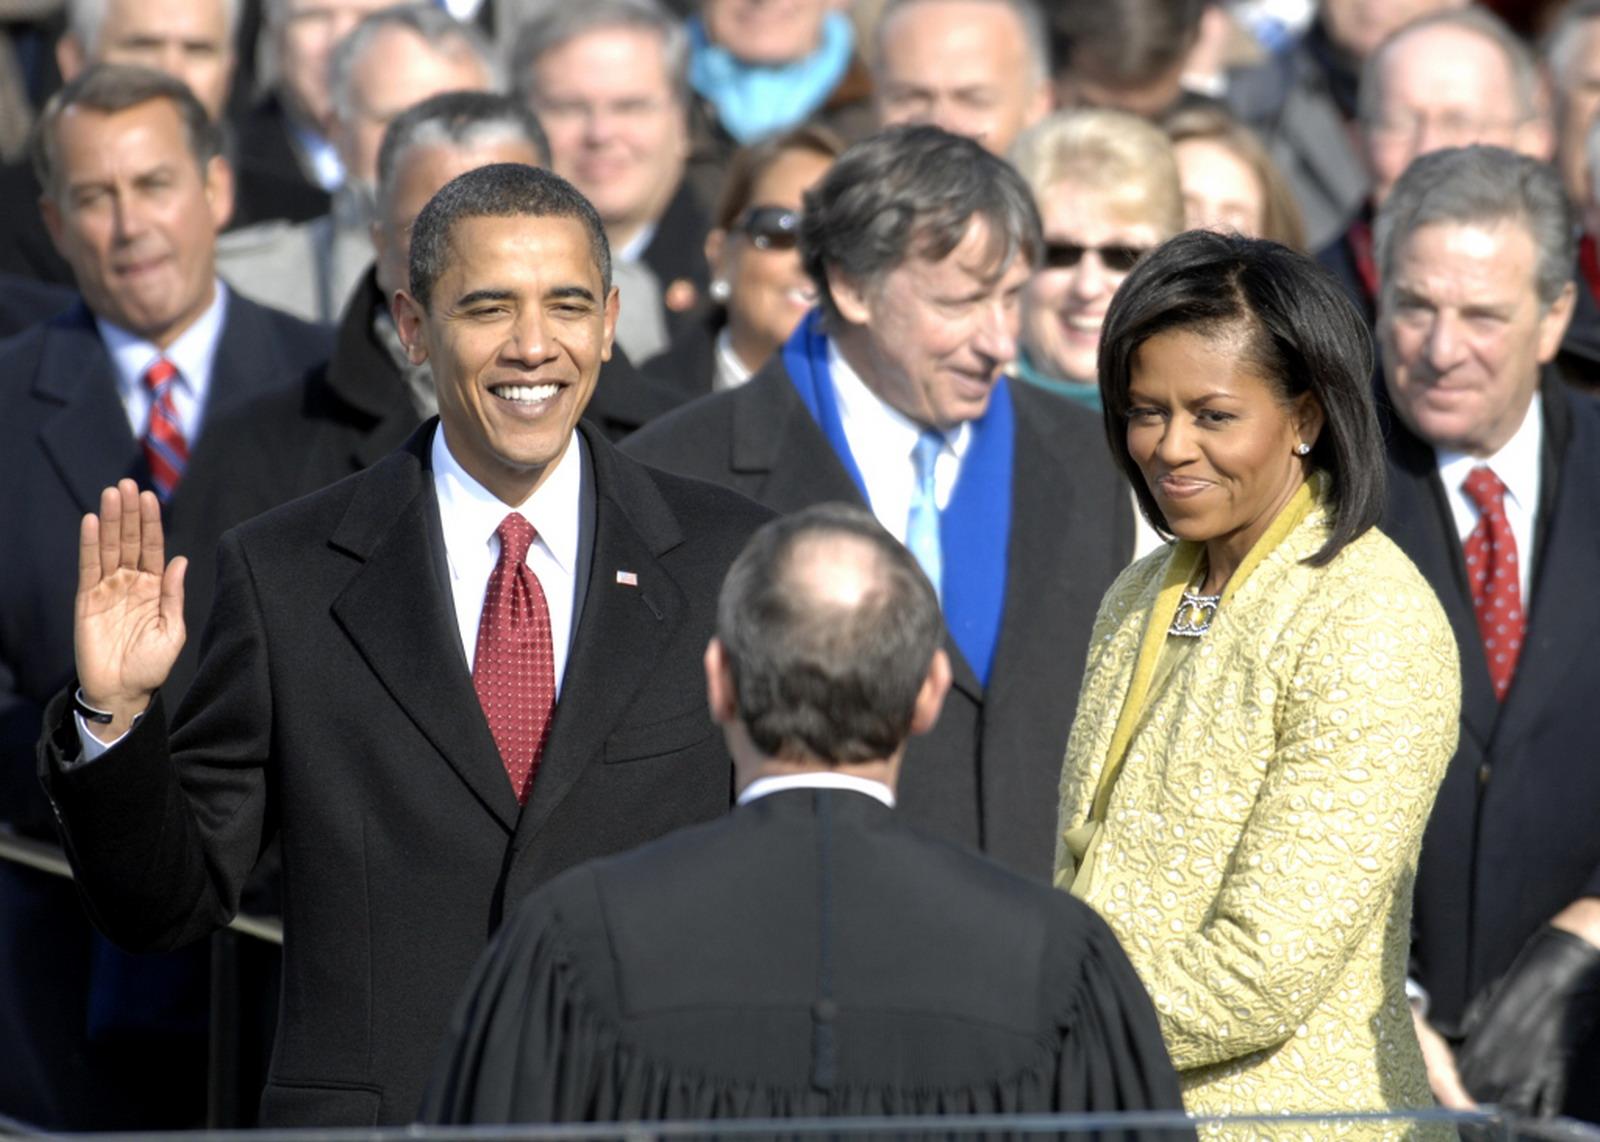 Barack Obama elnöki beiktatása 2009. január 20-án (Kép: Wikipedia)